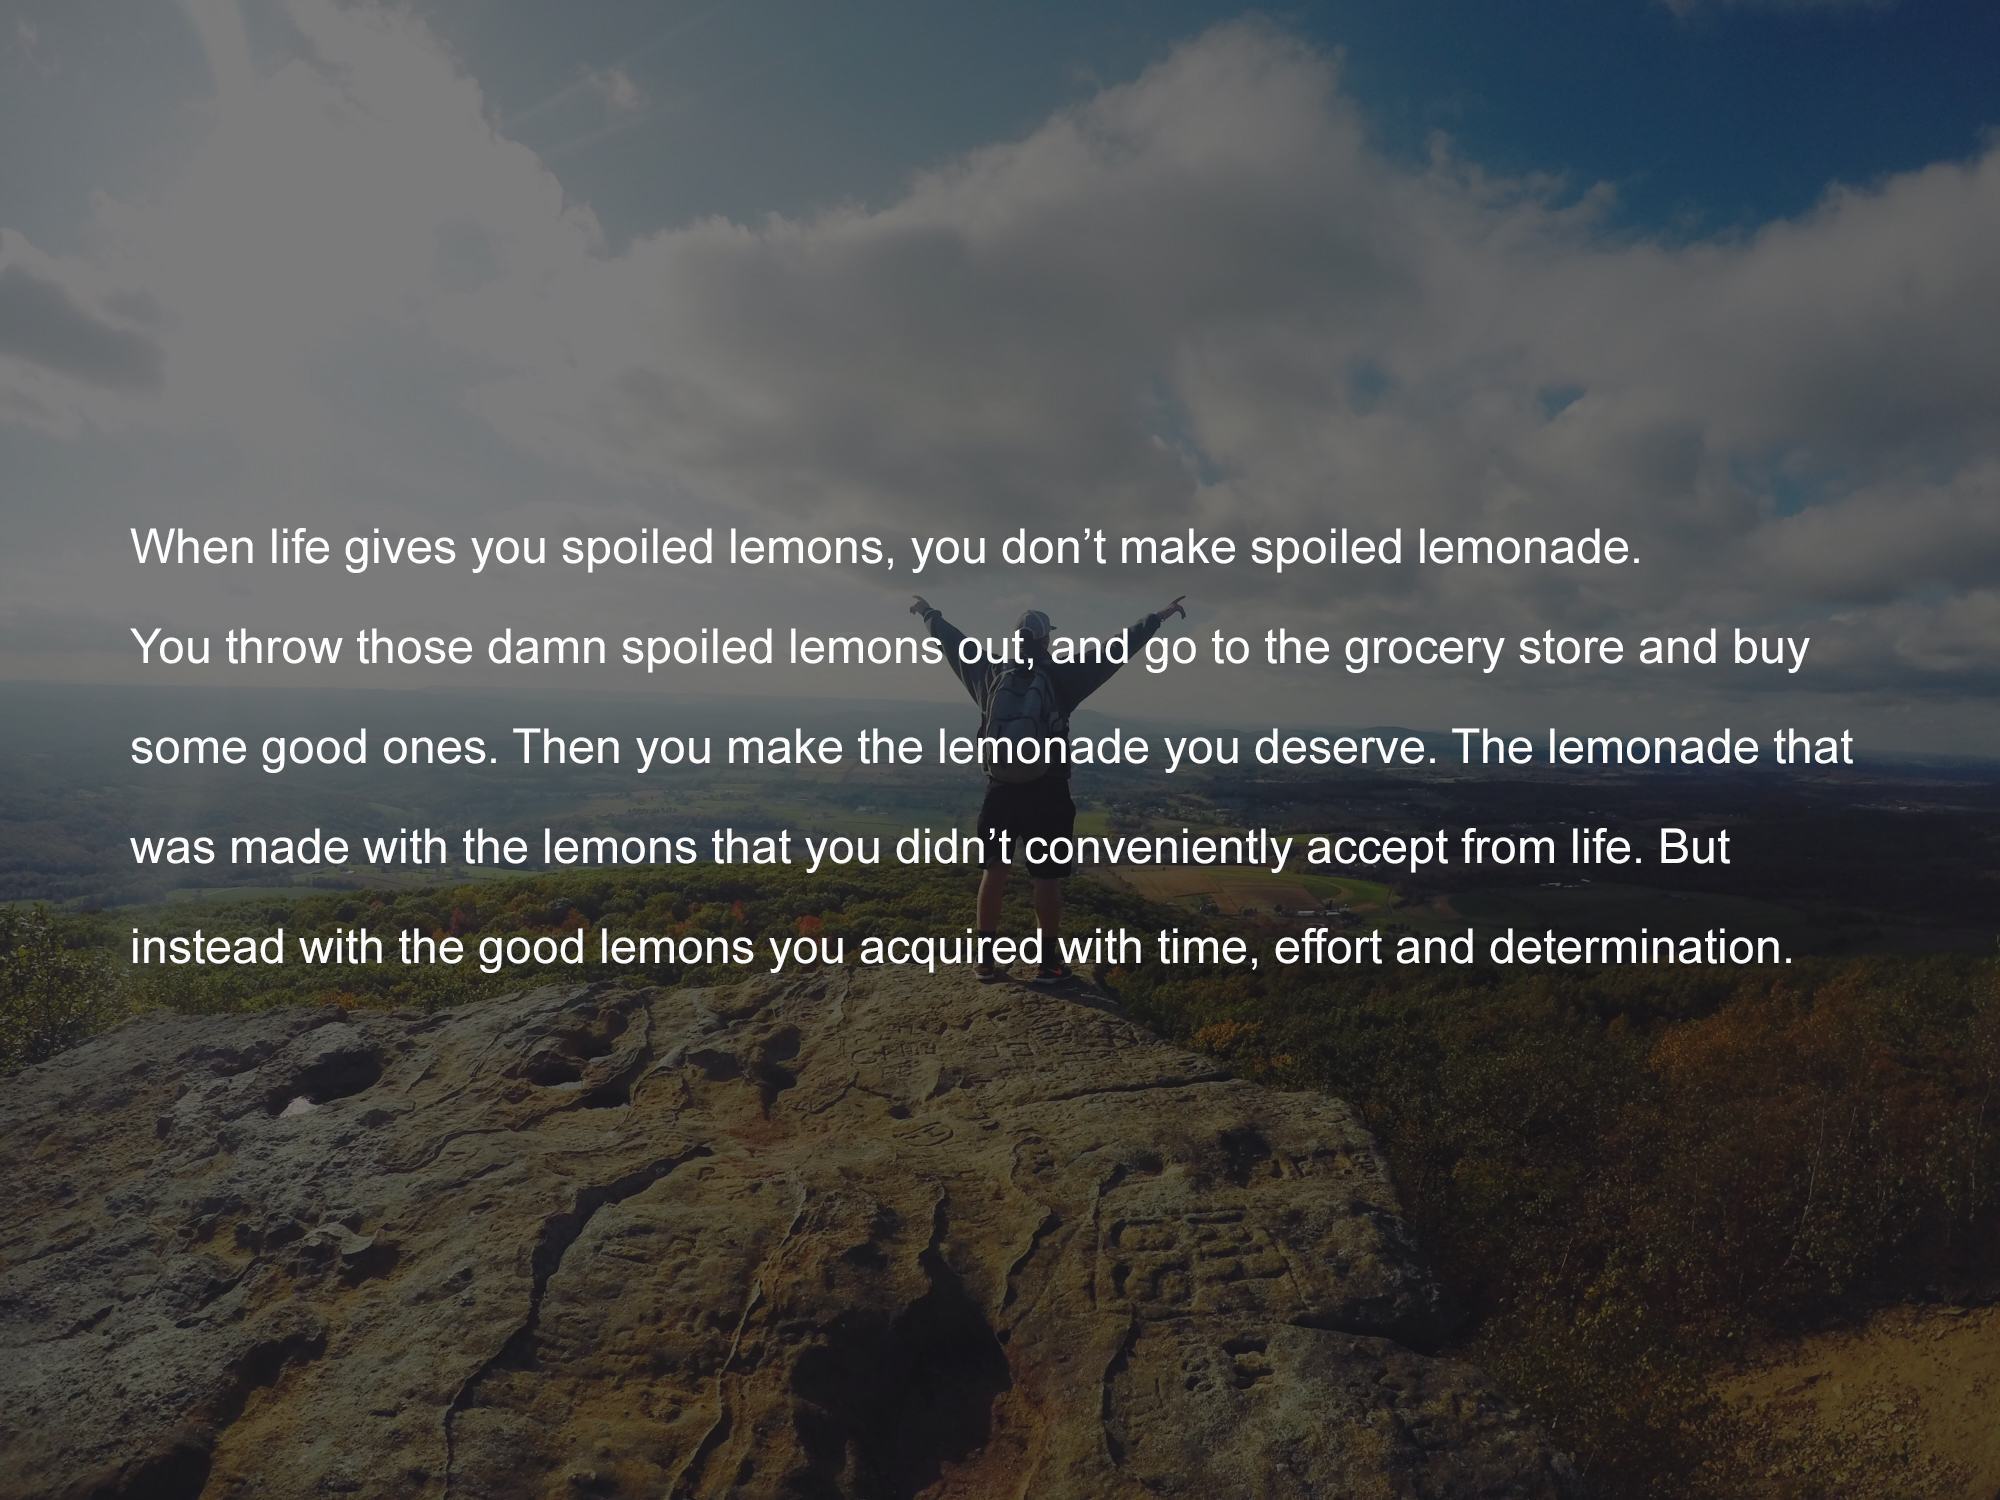 [Image] Life's Lemon